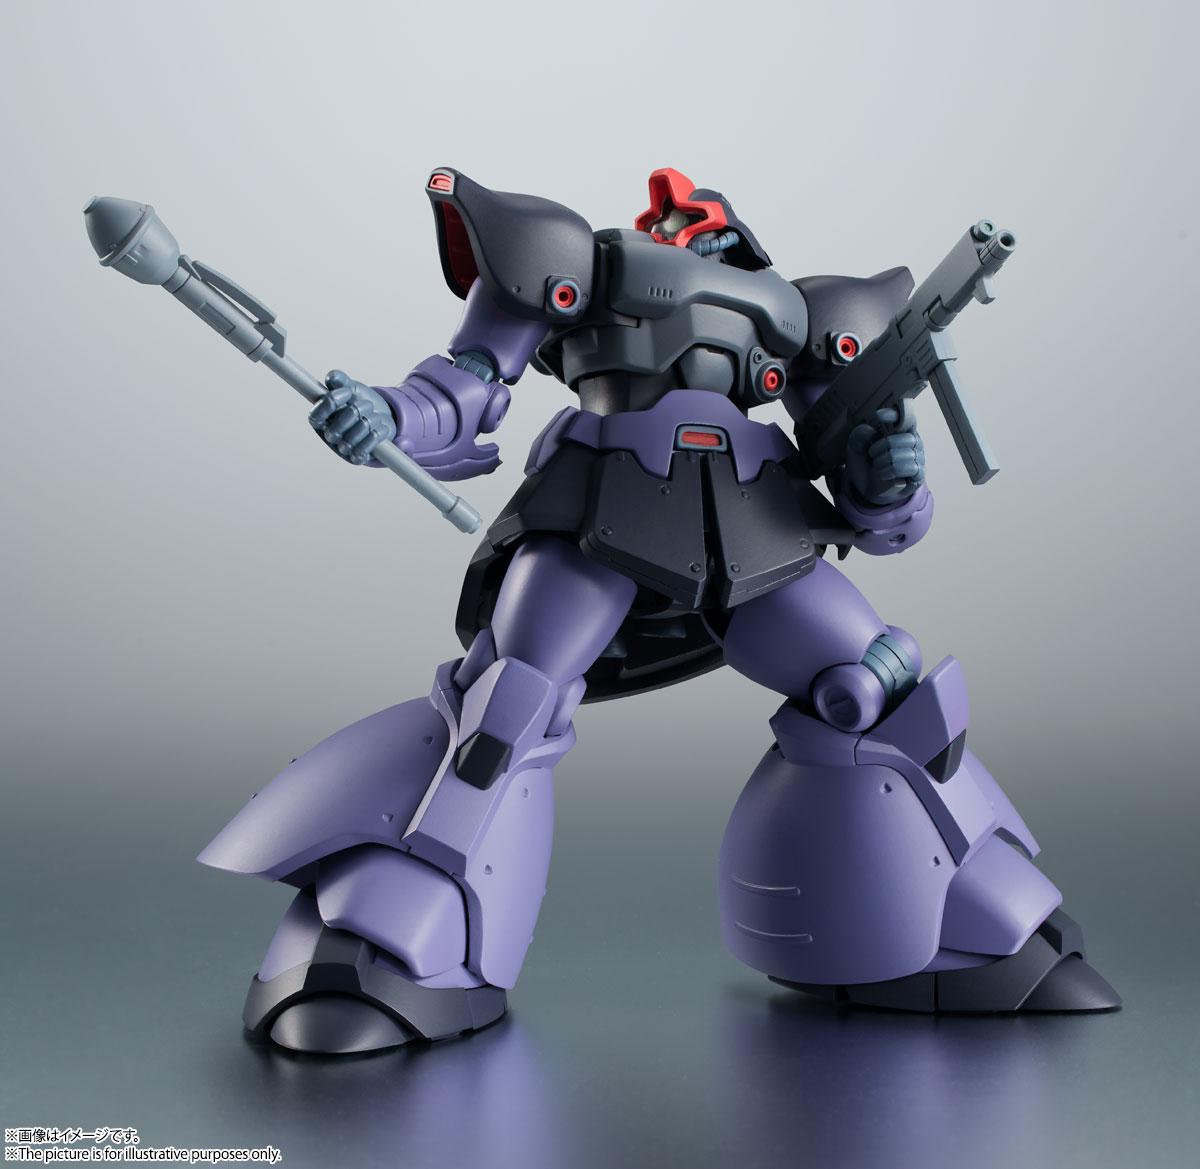 ROBOT魂〈SIDE MS〉『MS-09R-2 リック・ドムⅡ ver. A.N.I.M.E.』機動戦士ガンダム0083 可動フィギュア-004